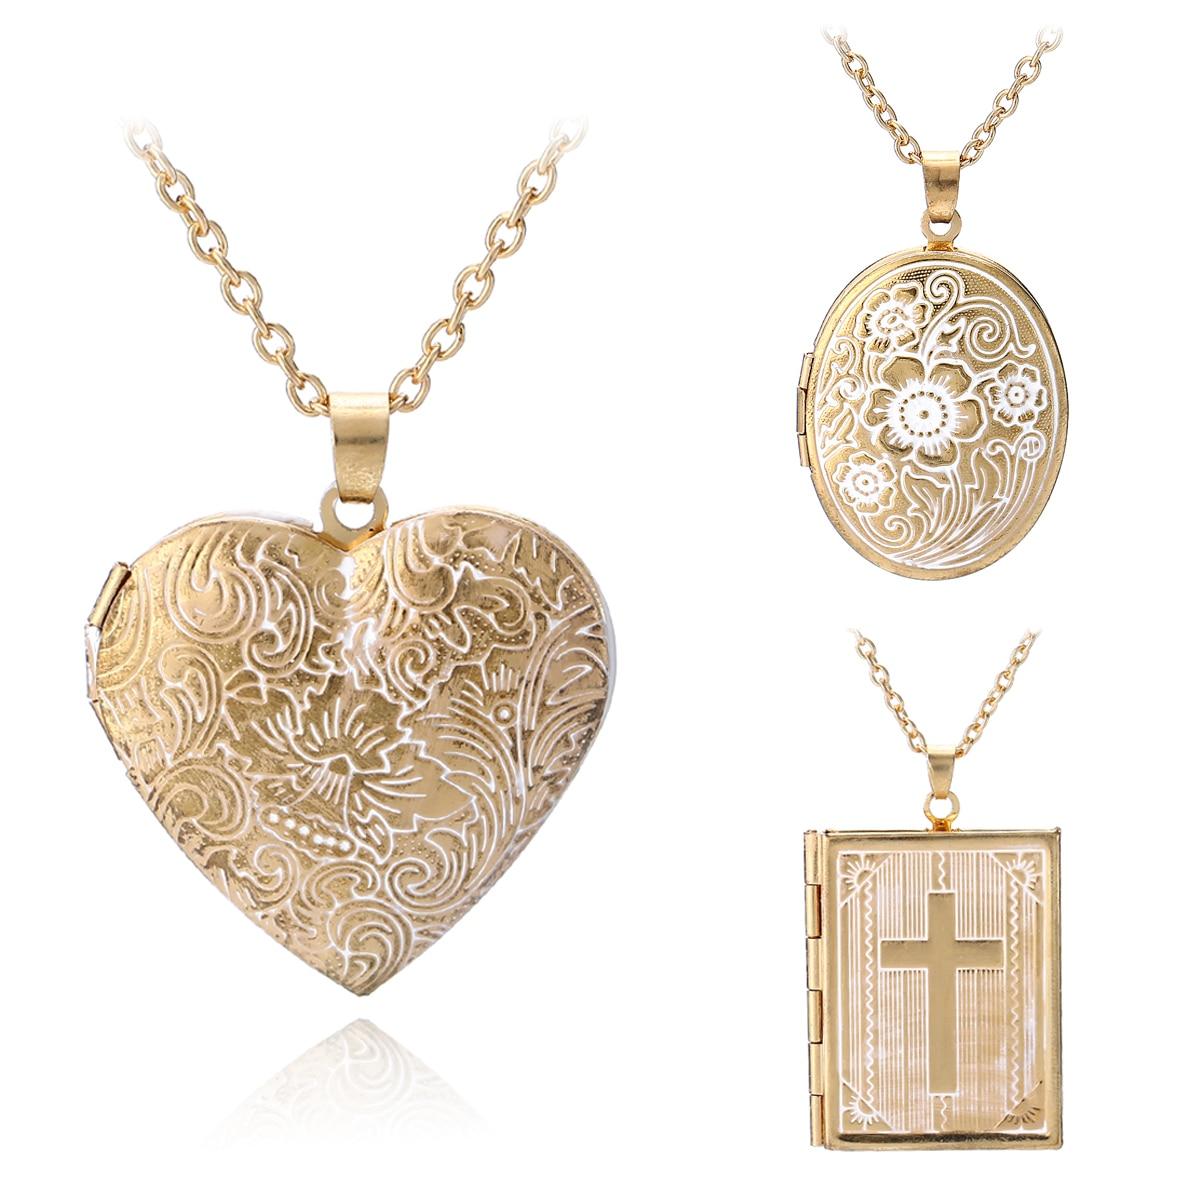 Collar con medallón cruzado de Shellhard, joyería de moda de Color dorado, corazón de memoria, collares con colgante relicario para mujeres y hombres